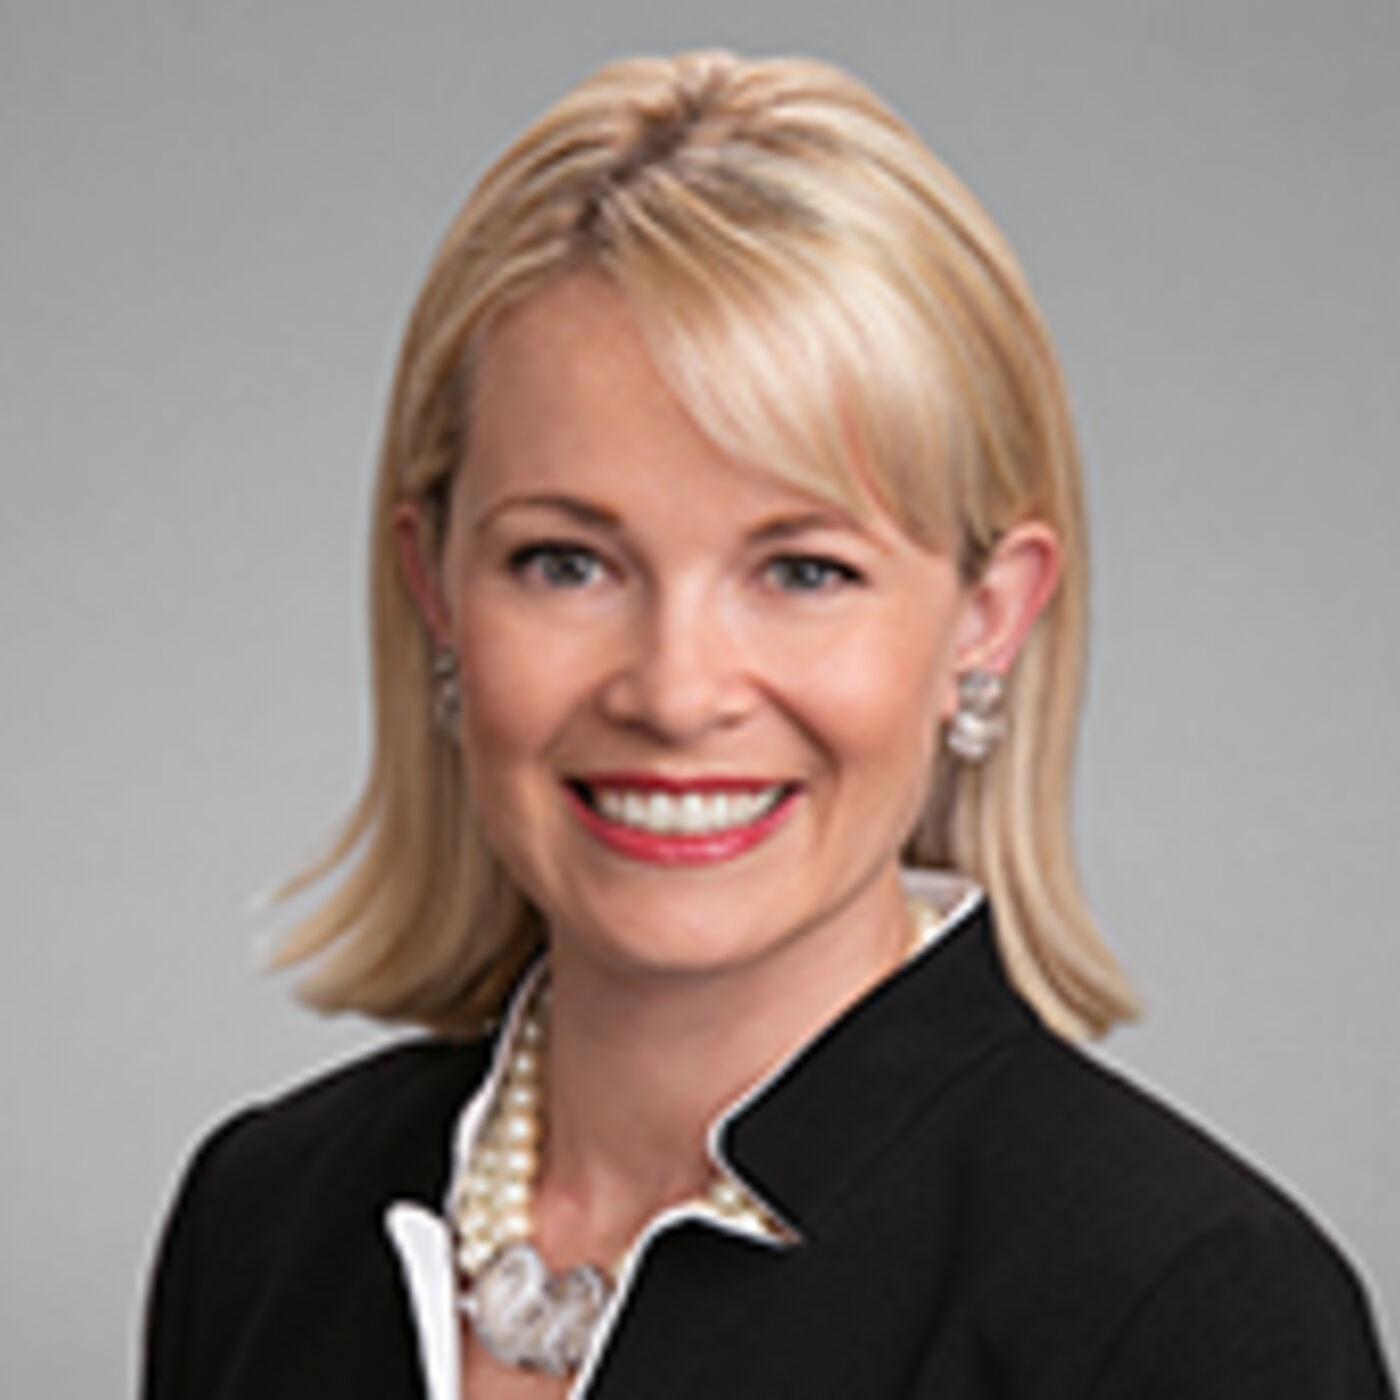 Hillary Holmes - Corporate Partner with Gibson, Dunn & Crutcher